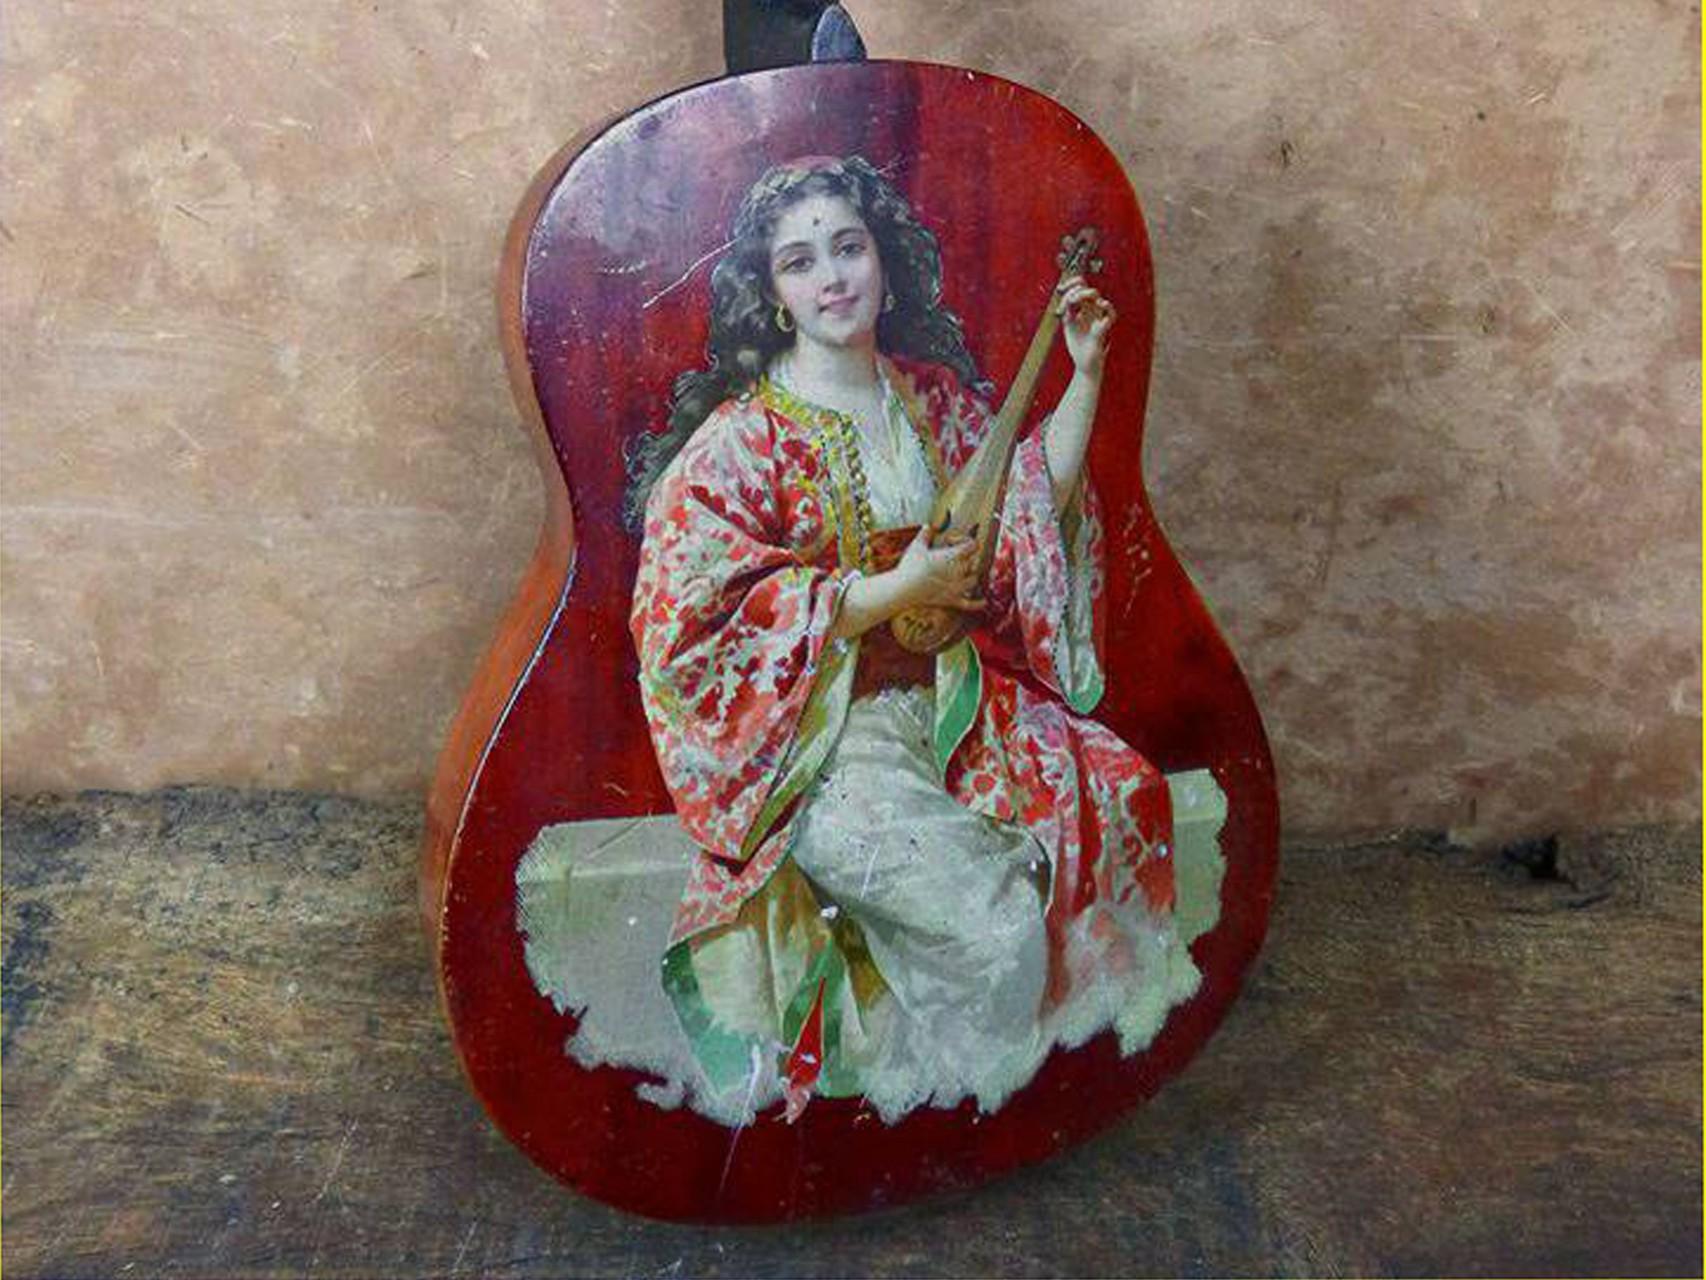 1929 Mandolinetto